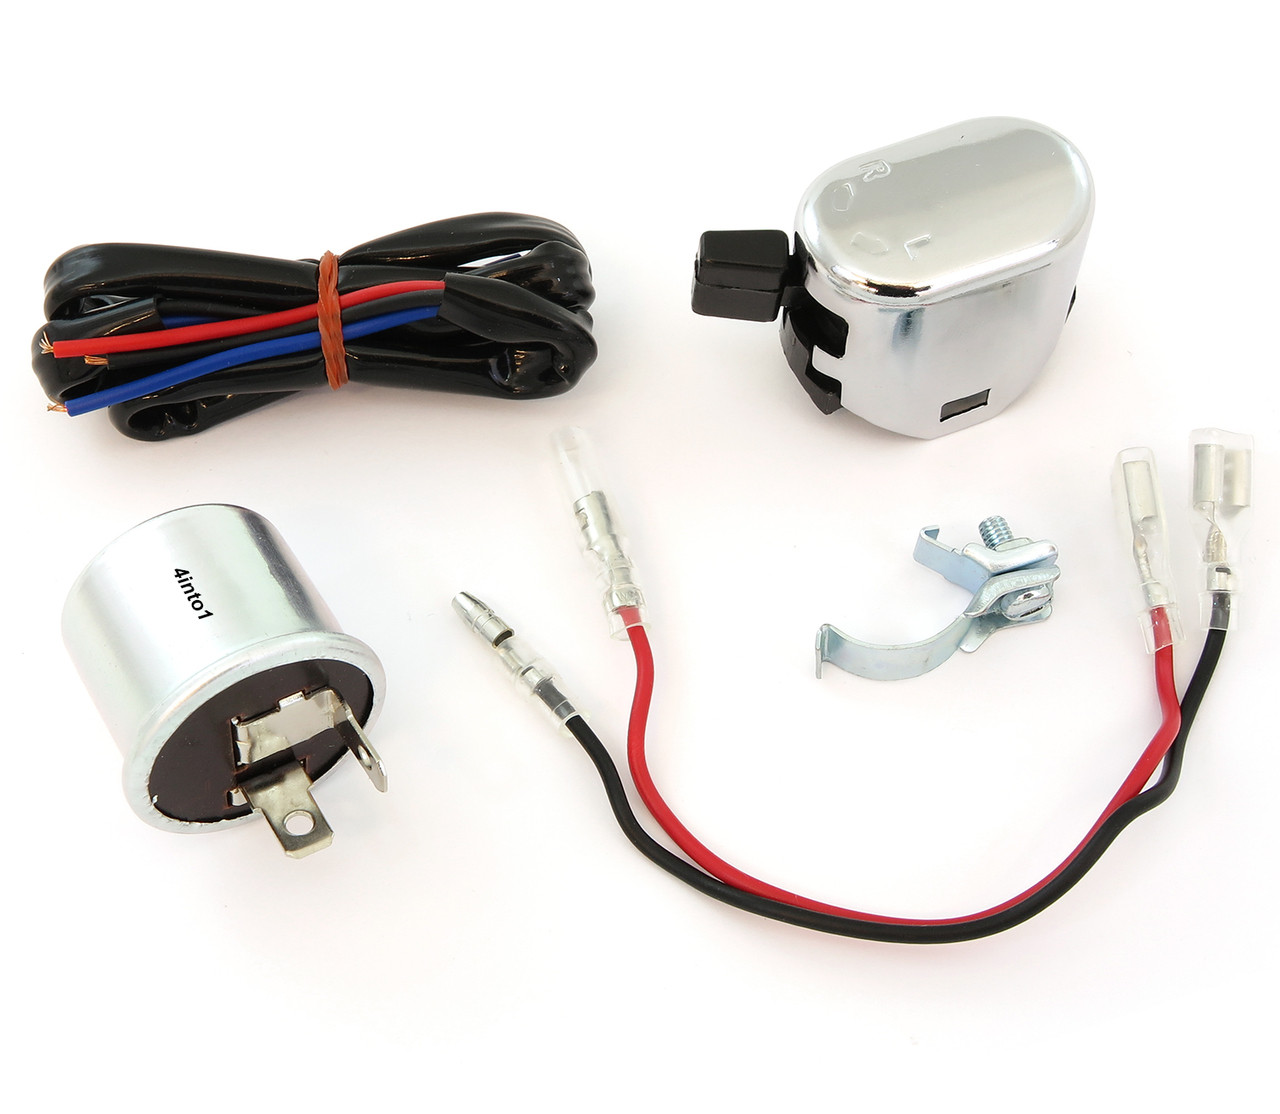 Ks Turn Signal Kit Relay Wiring Switch Honda Cl72 Image 1